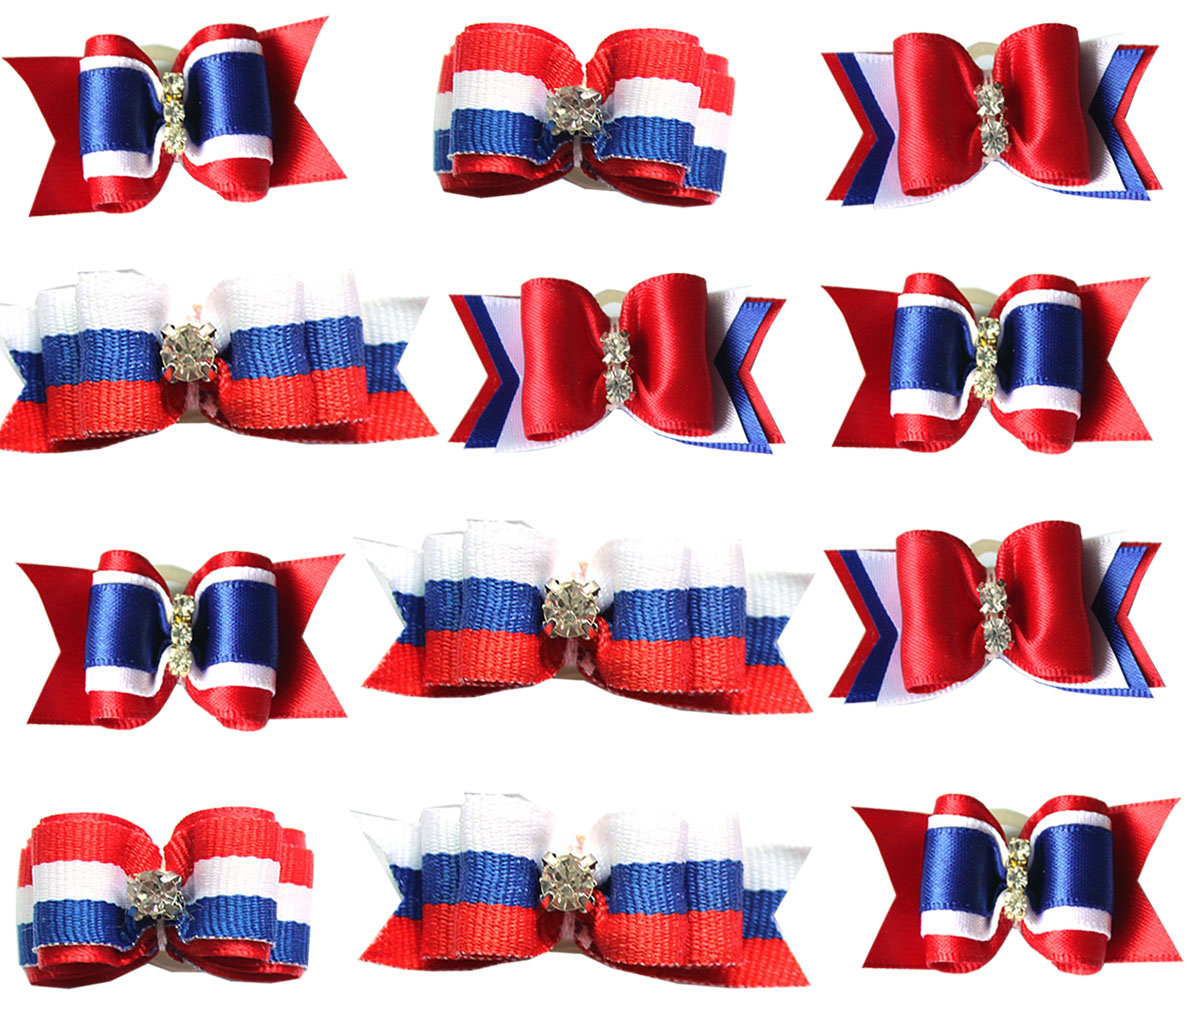 50pcs Whole Sale font b Pet b font Puppy Dog Cat Hair Bows 4th of July